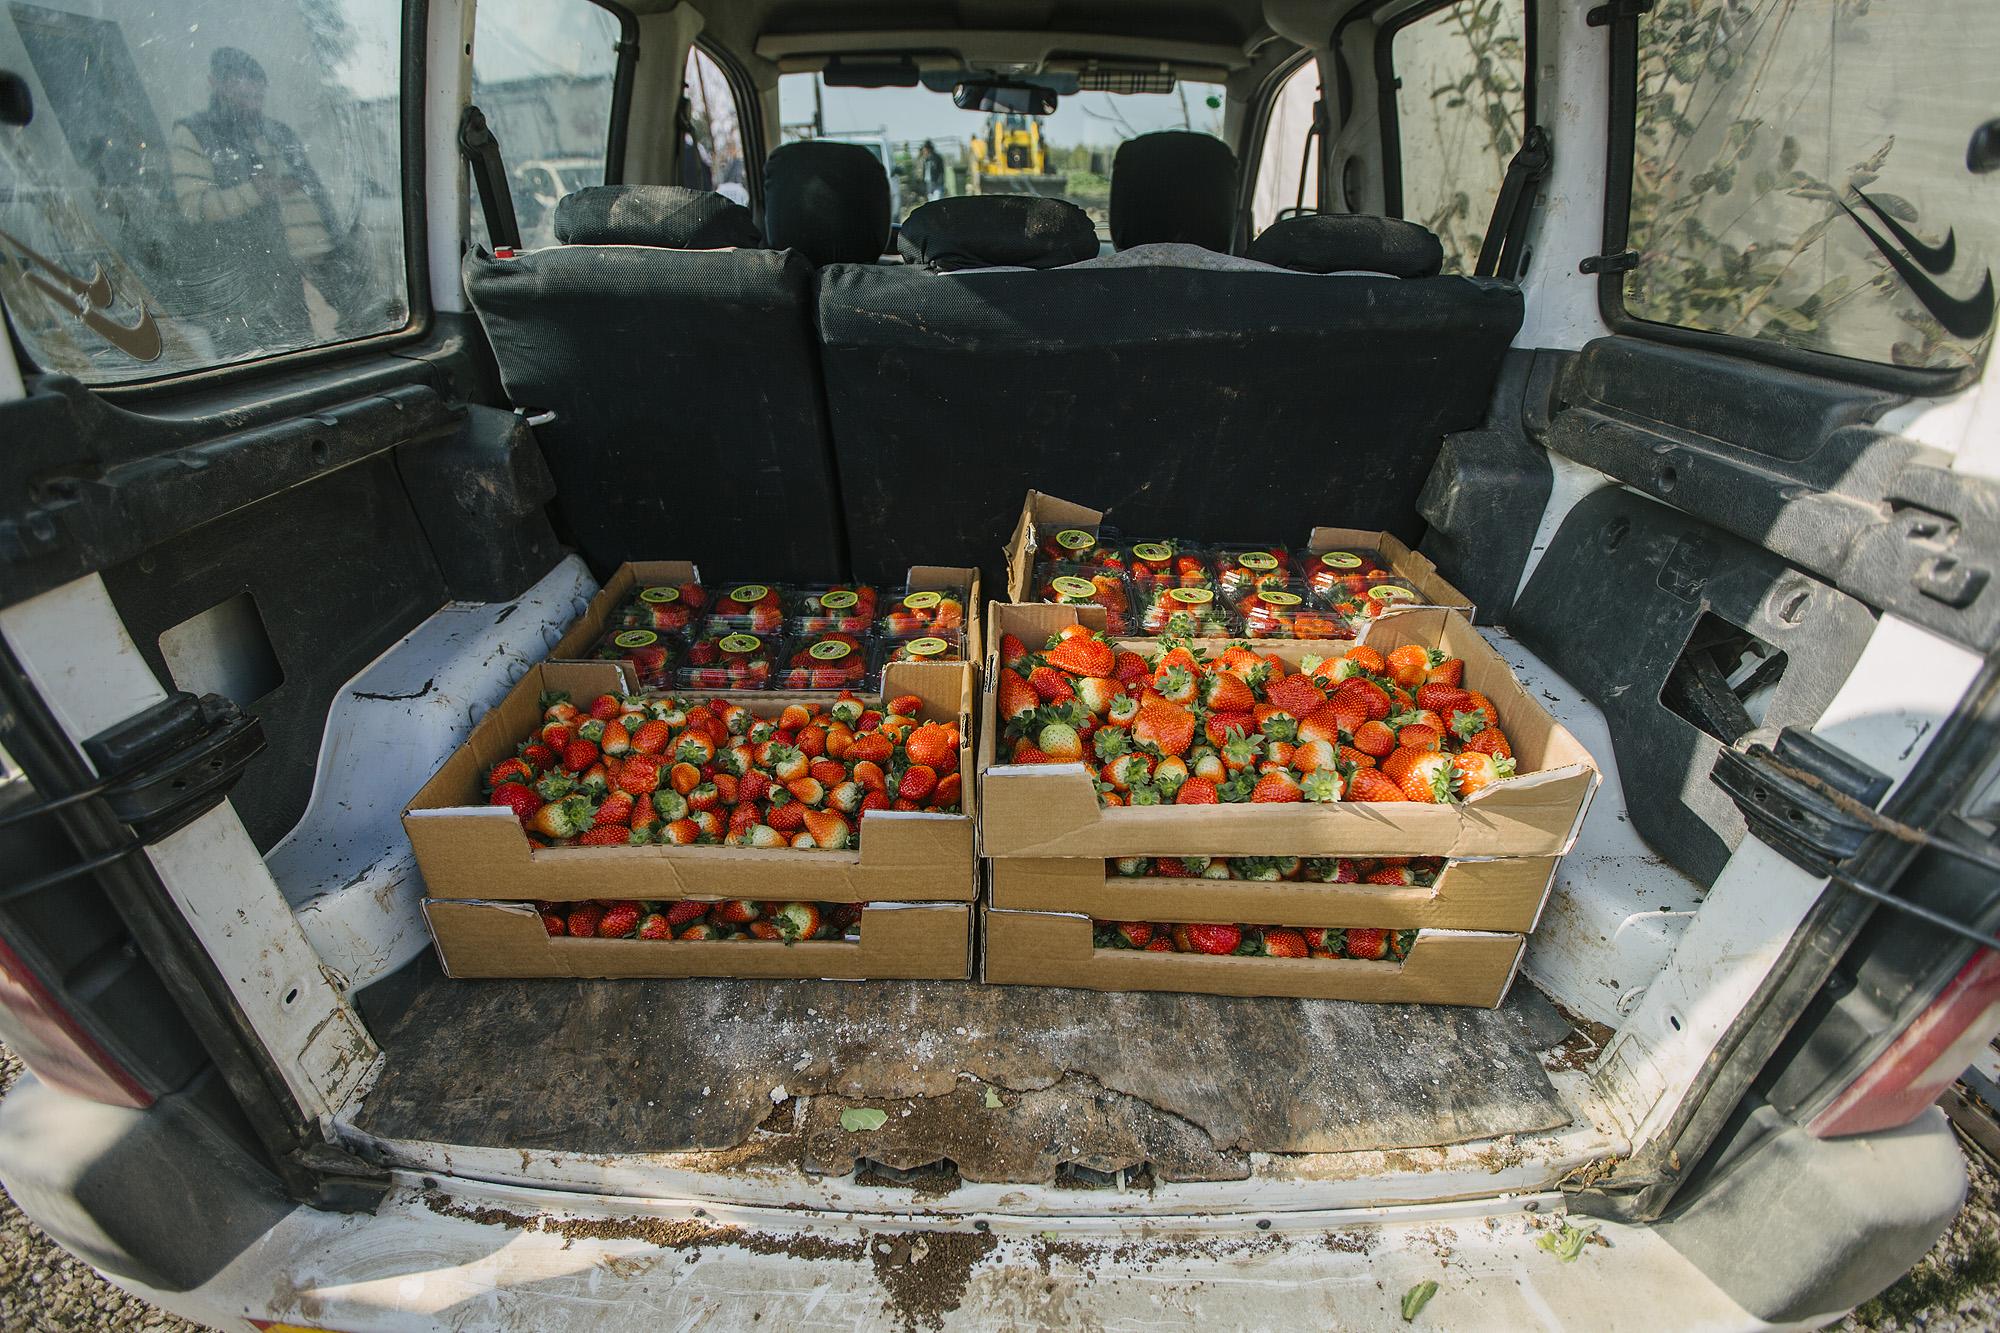 USAID-Israel-Day5-Strawberries-_07A7920.jpg